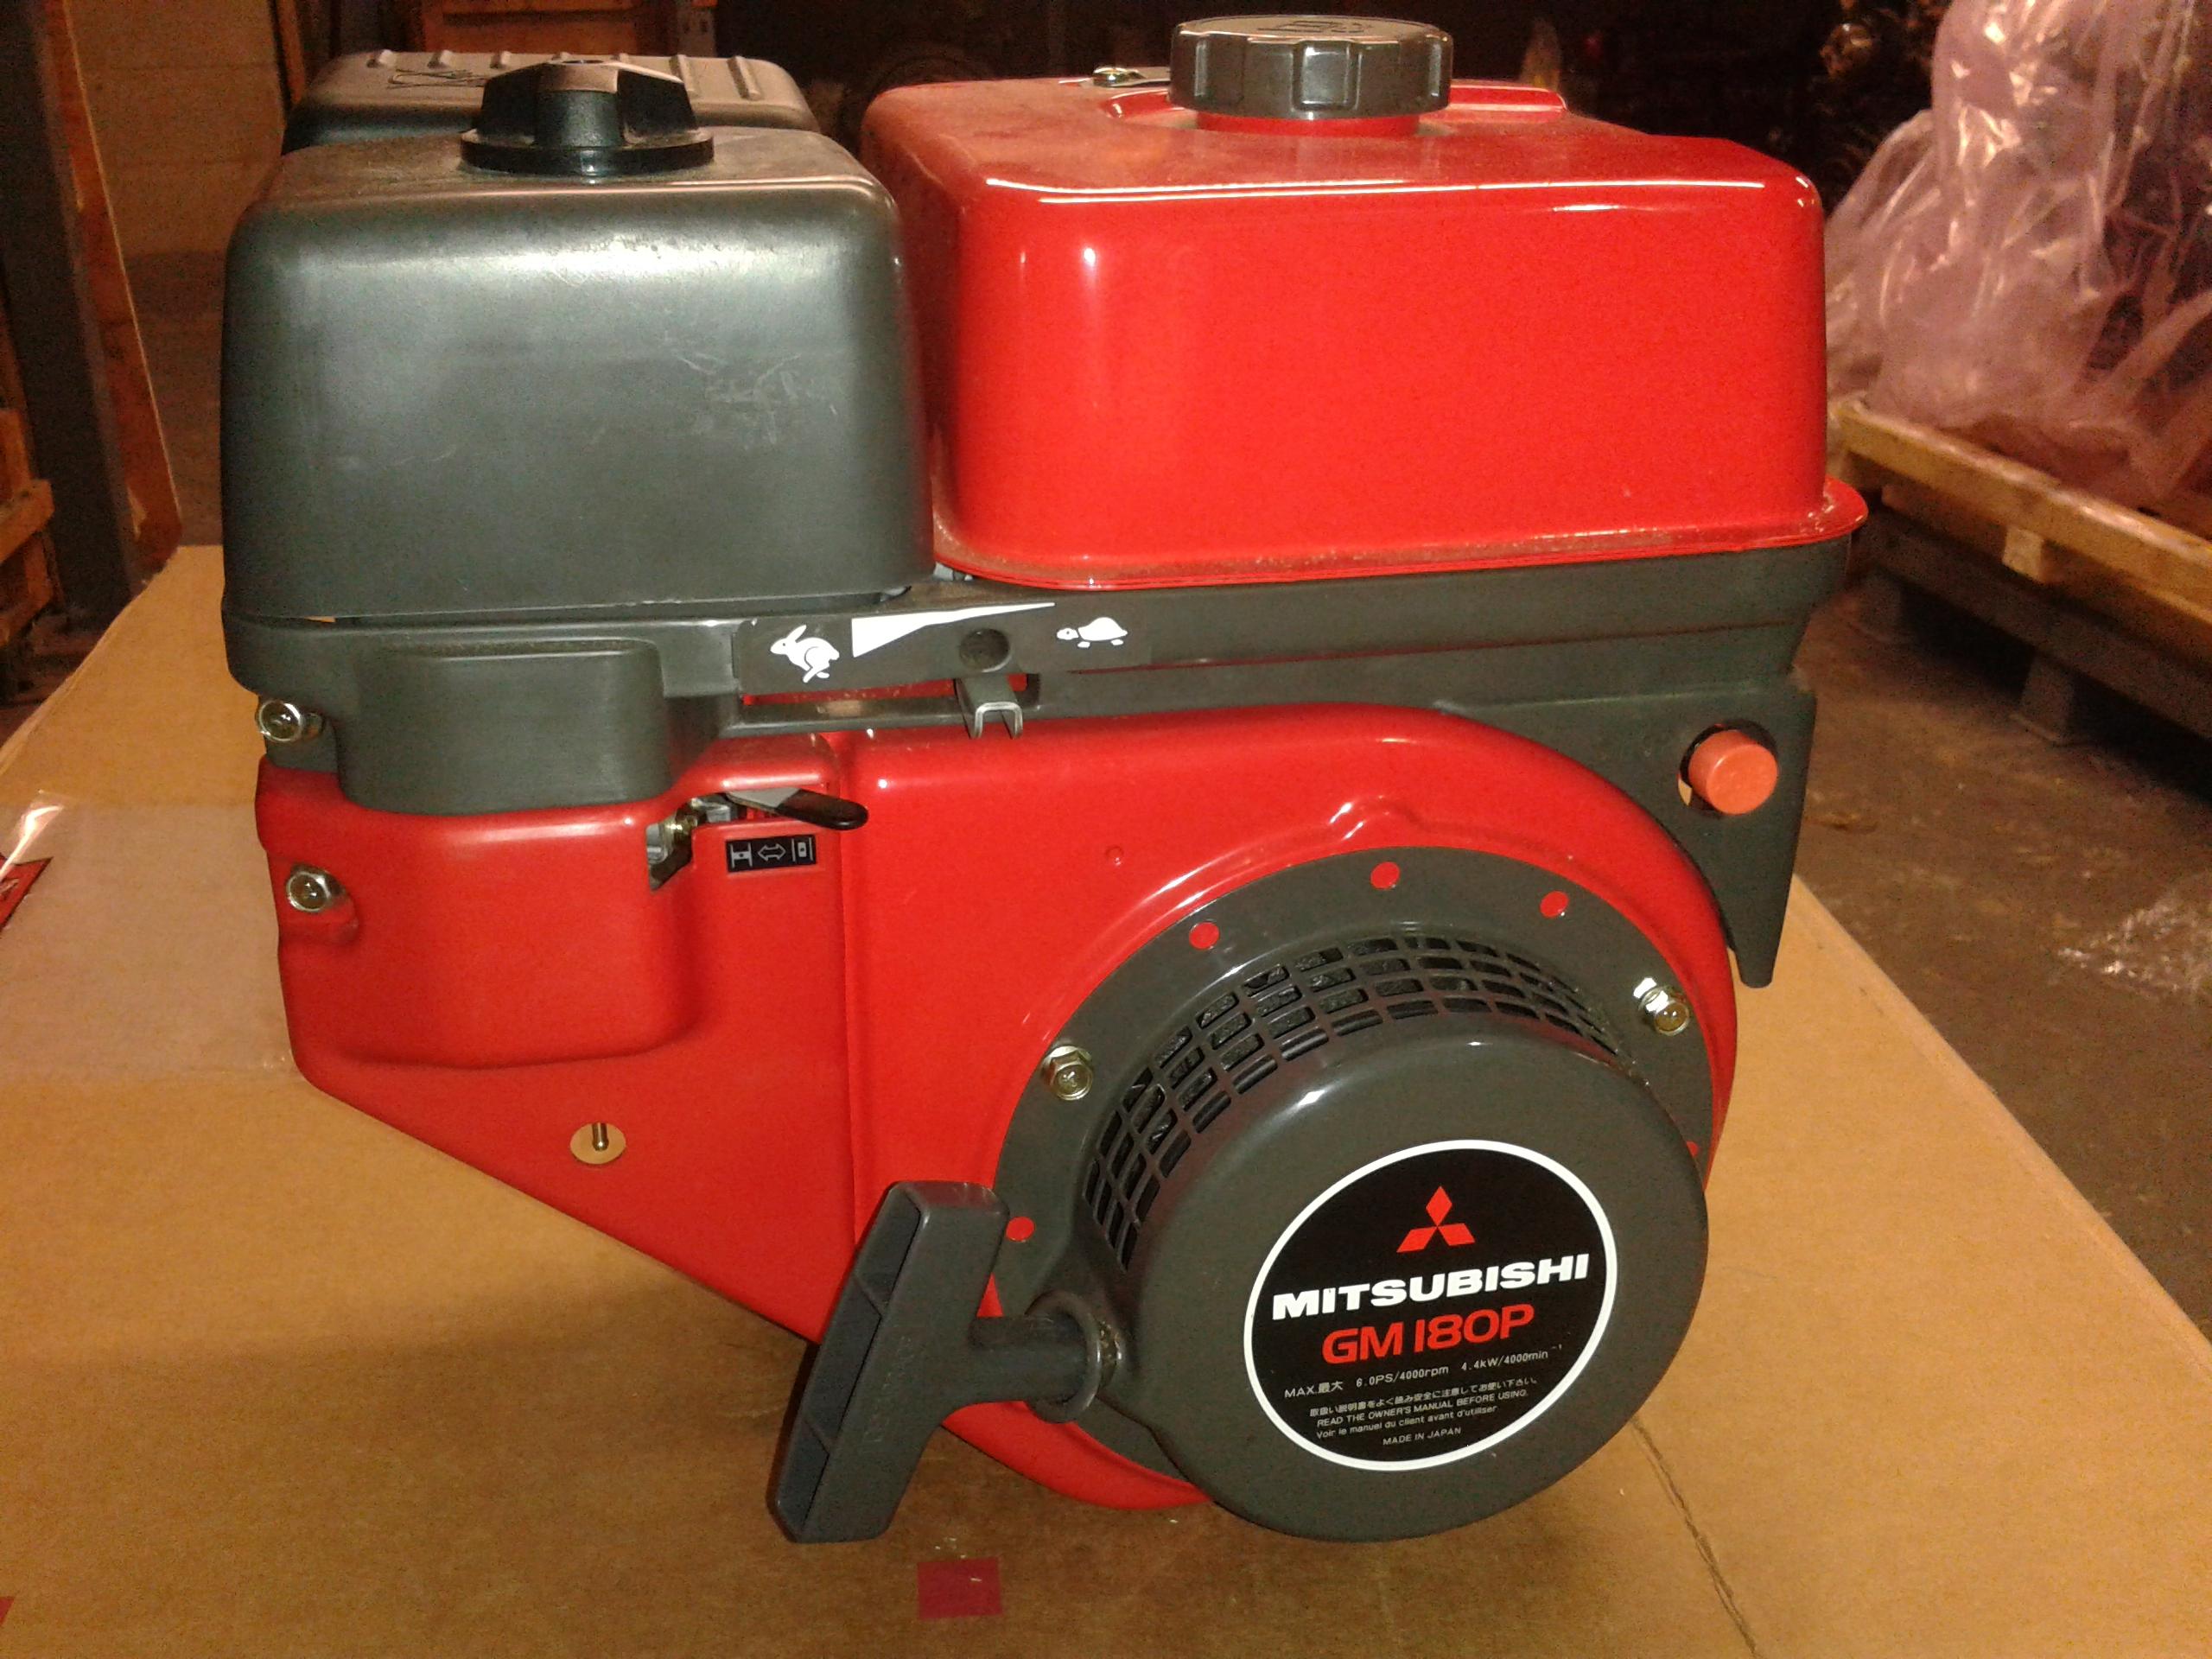 toyota jdm quality camry engine engines top mitsubishi details performance high com only royaljapanesemotors